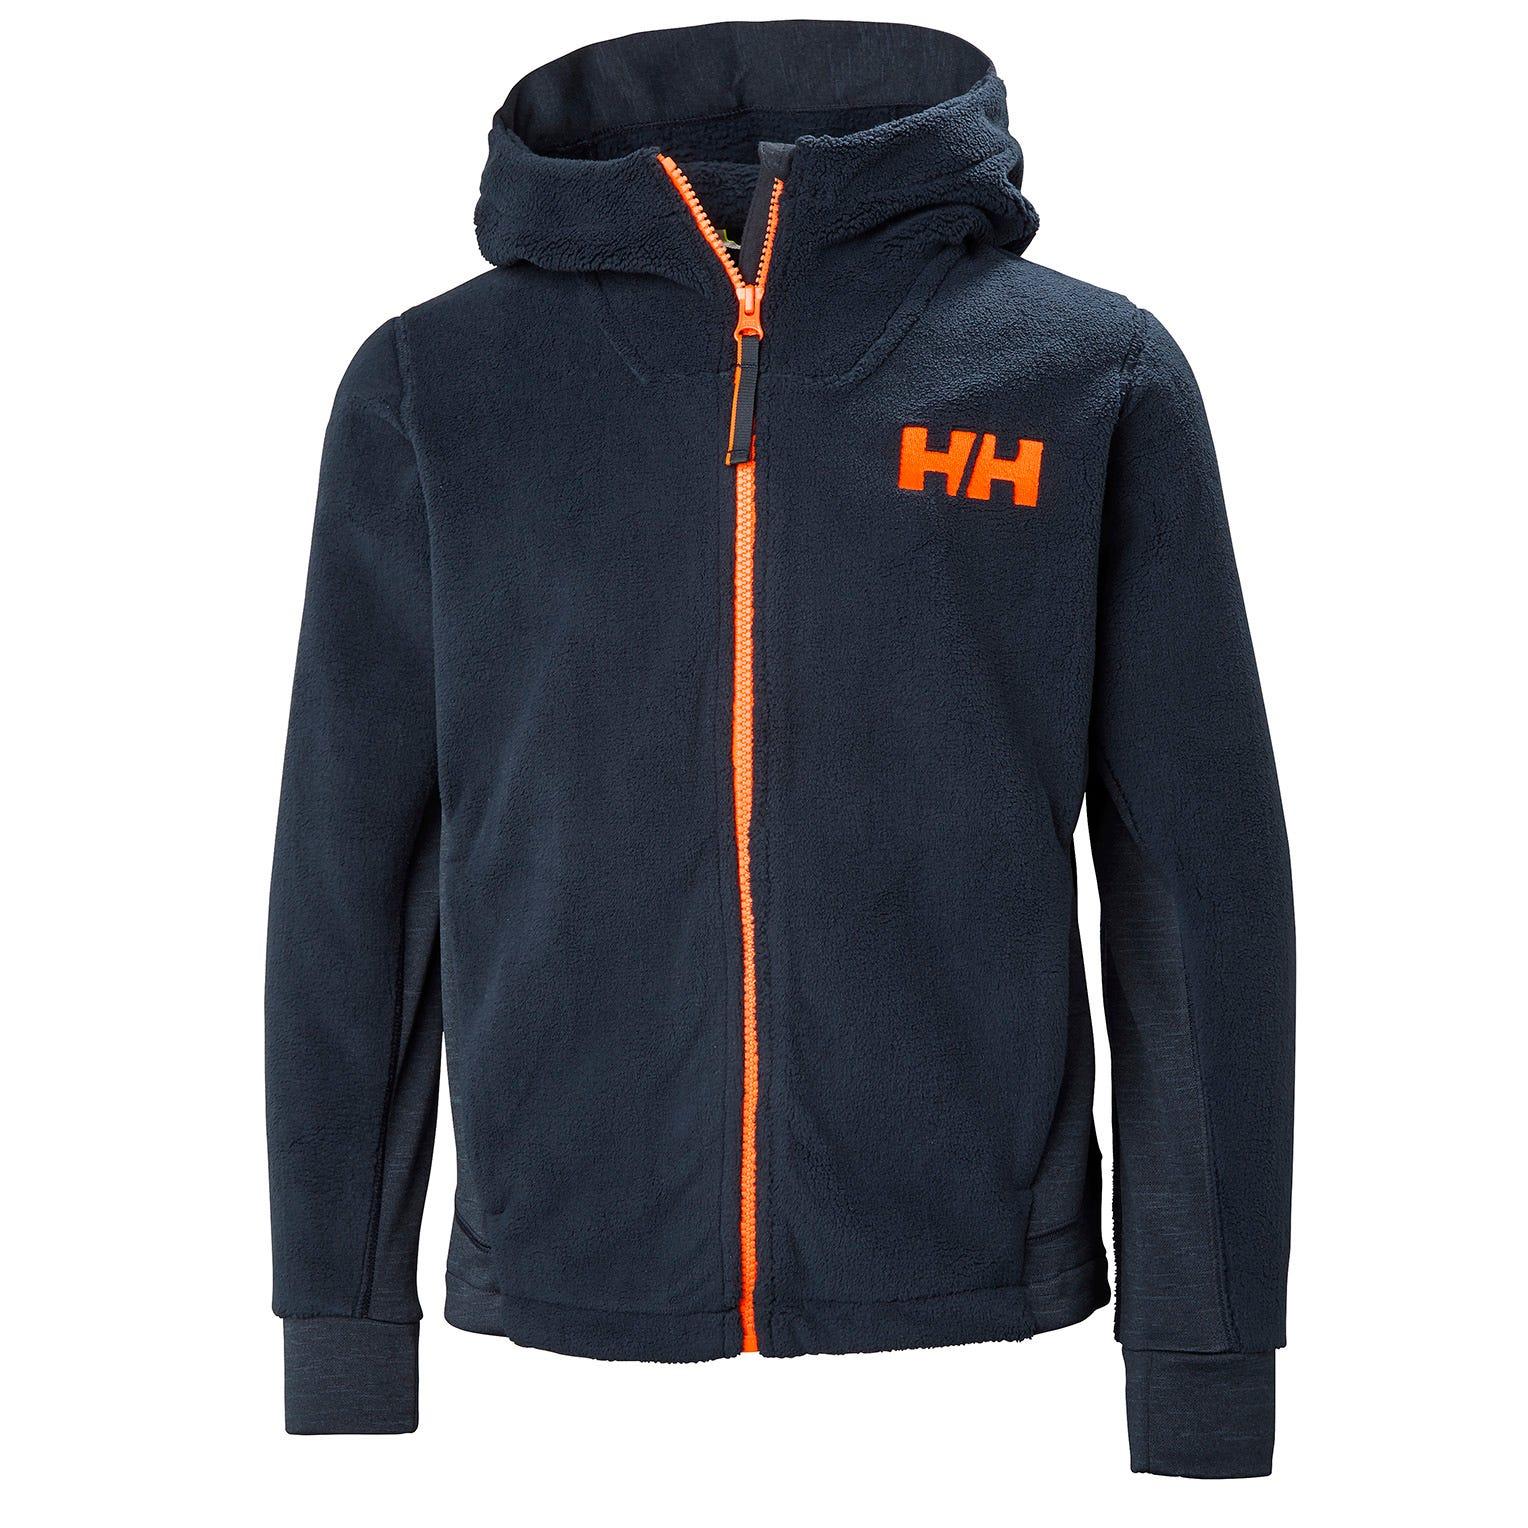 Helly Hansen Junior Chill Fz Hoodie Kids Fleece Navy 152/12